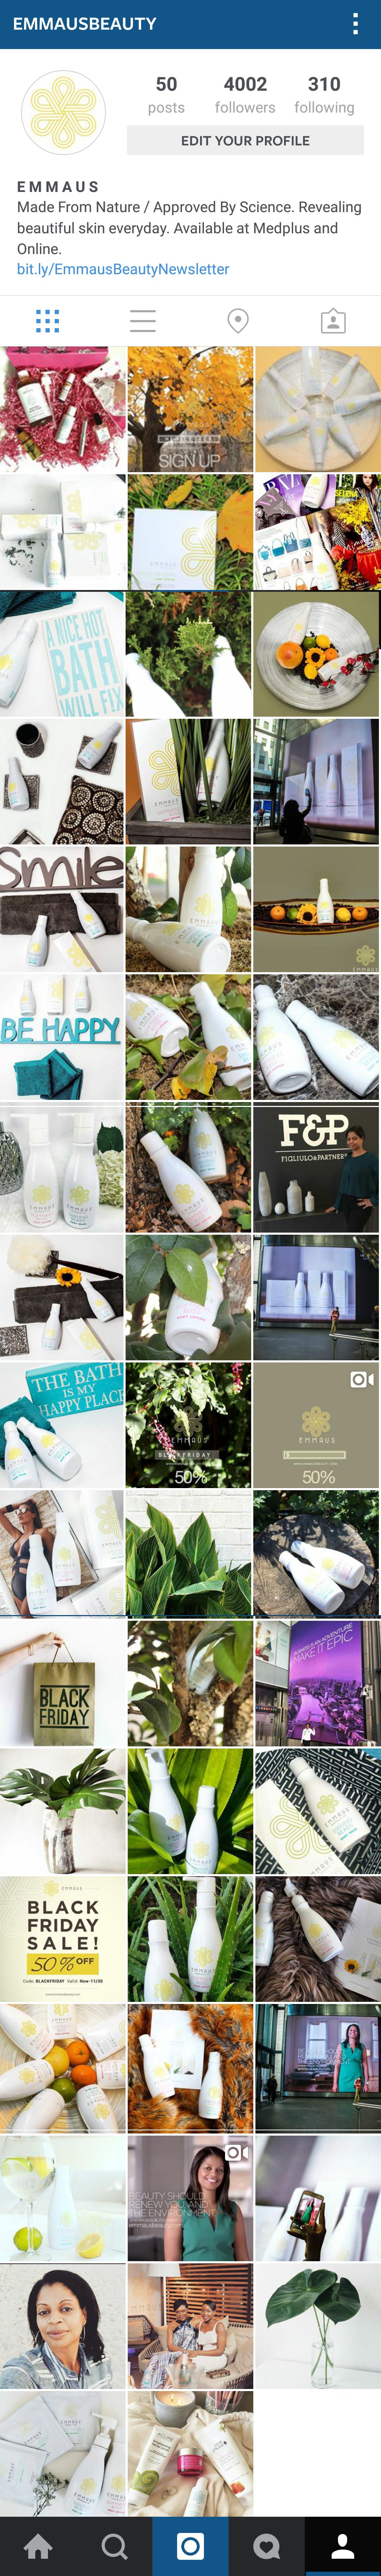 1 Emmaus Beauty Instagram Example Screen Shot